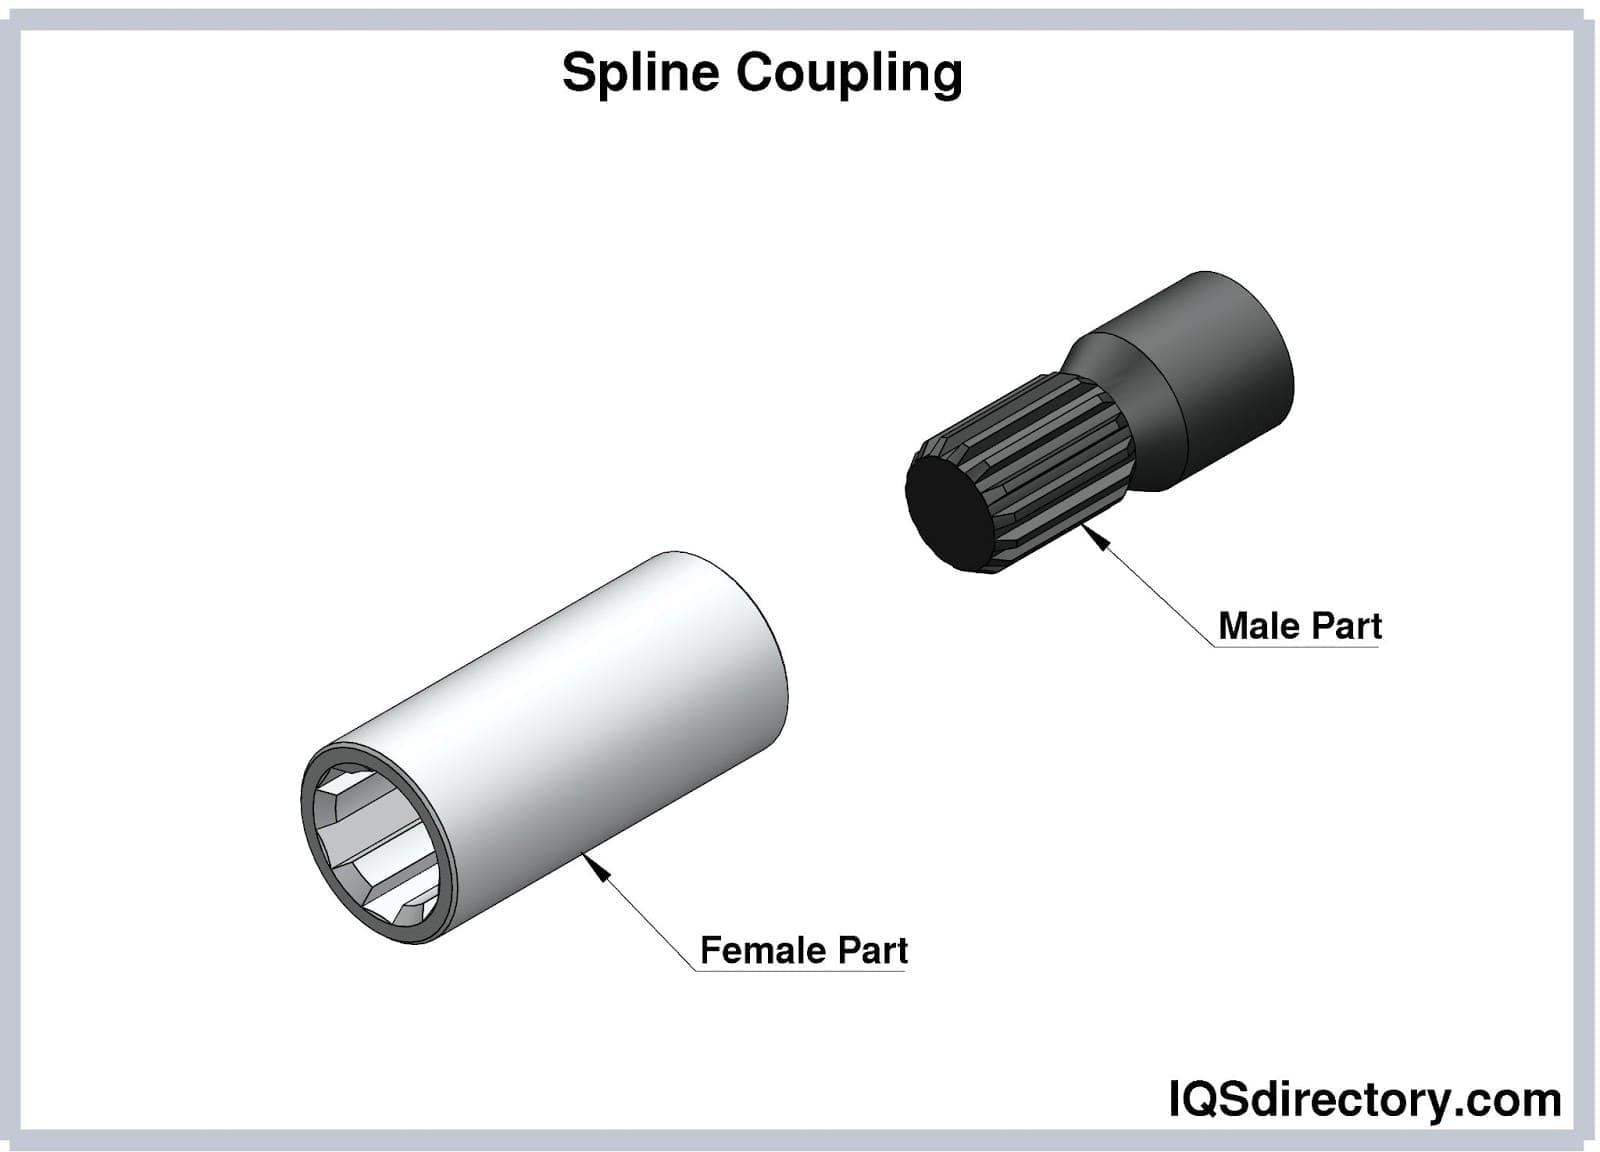 Spline Coupling